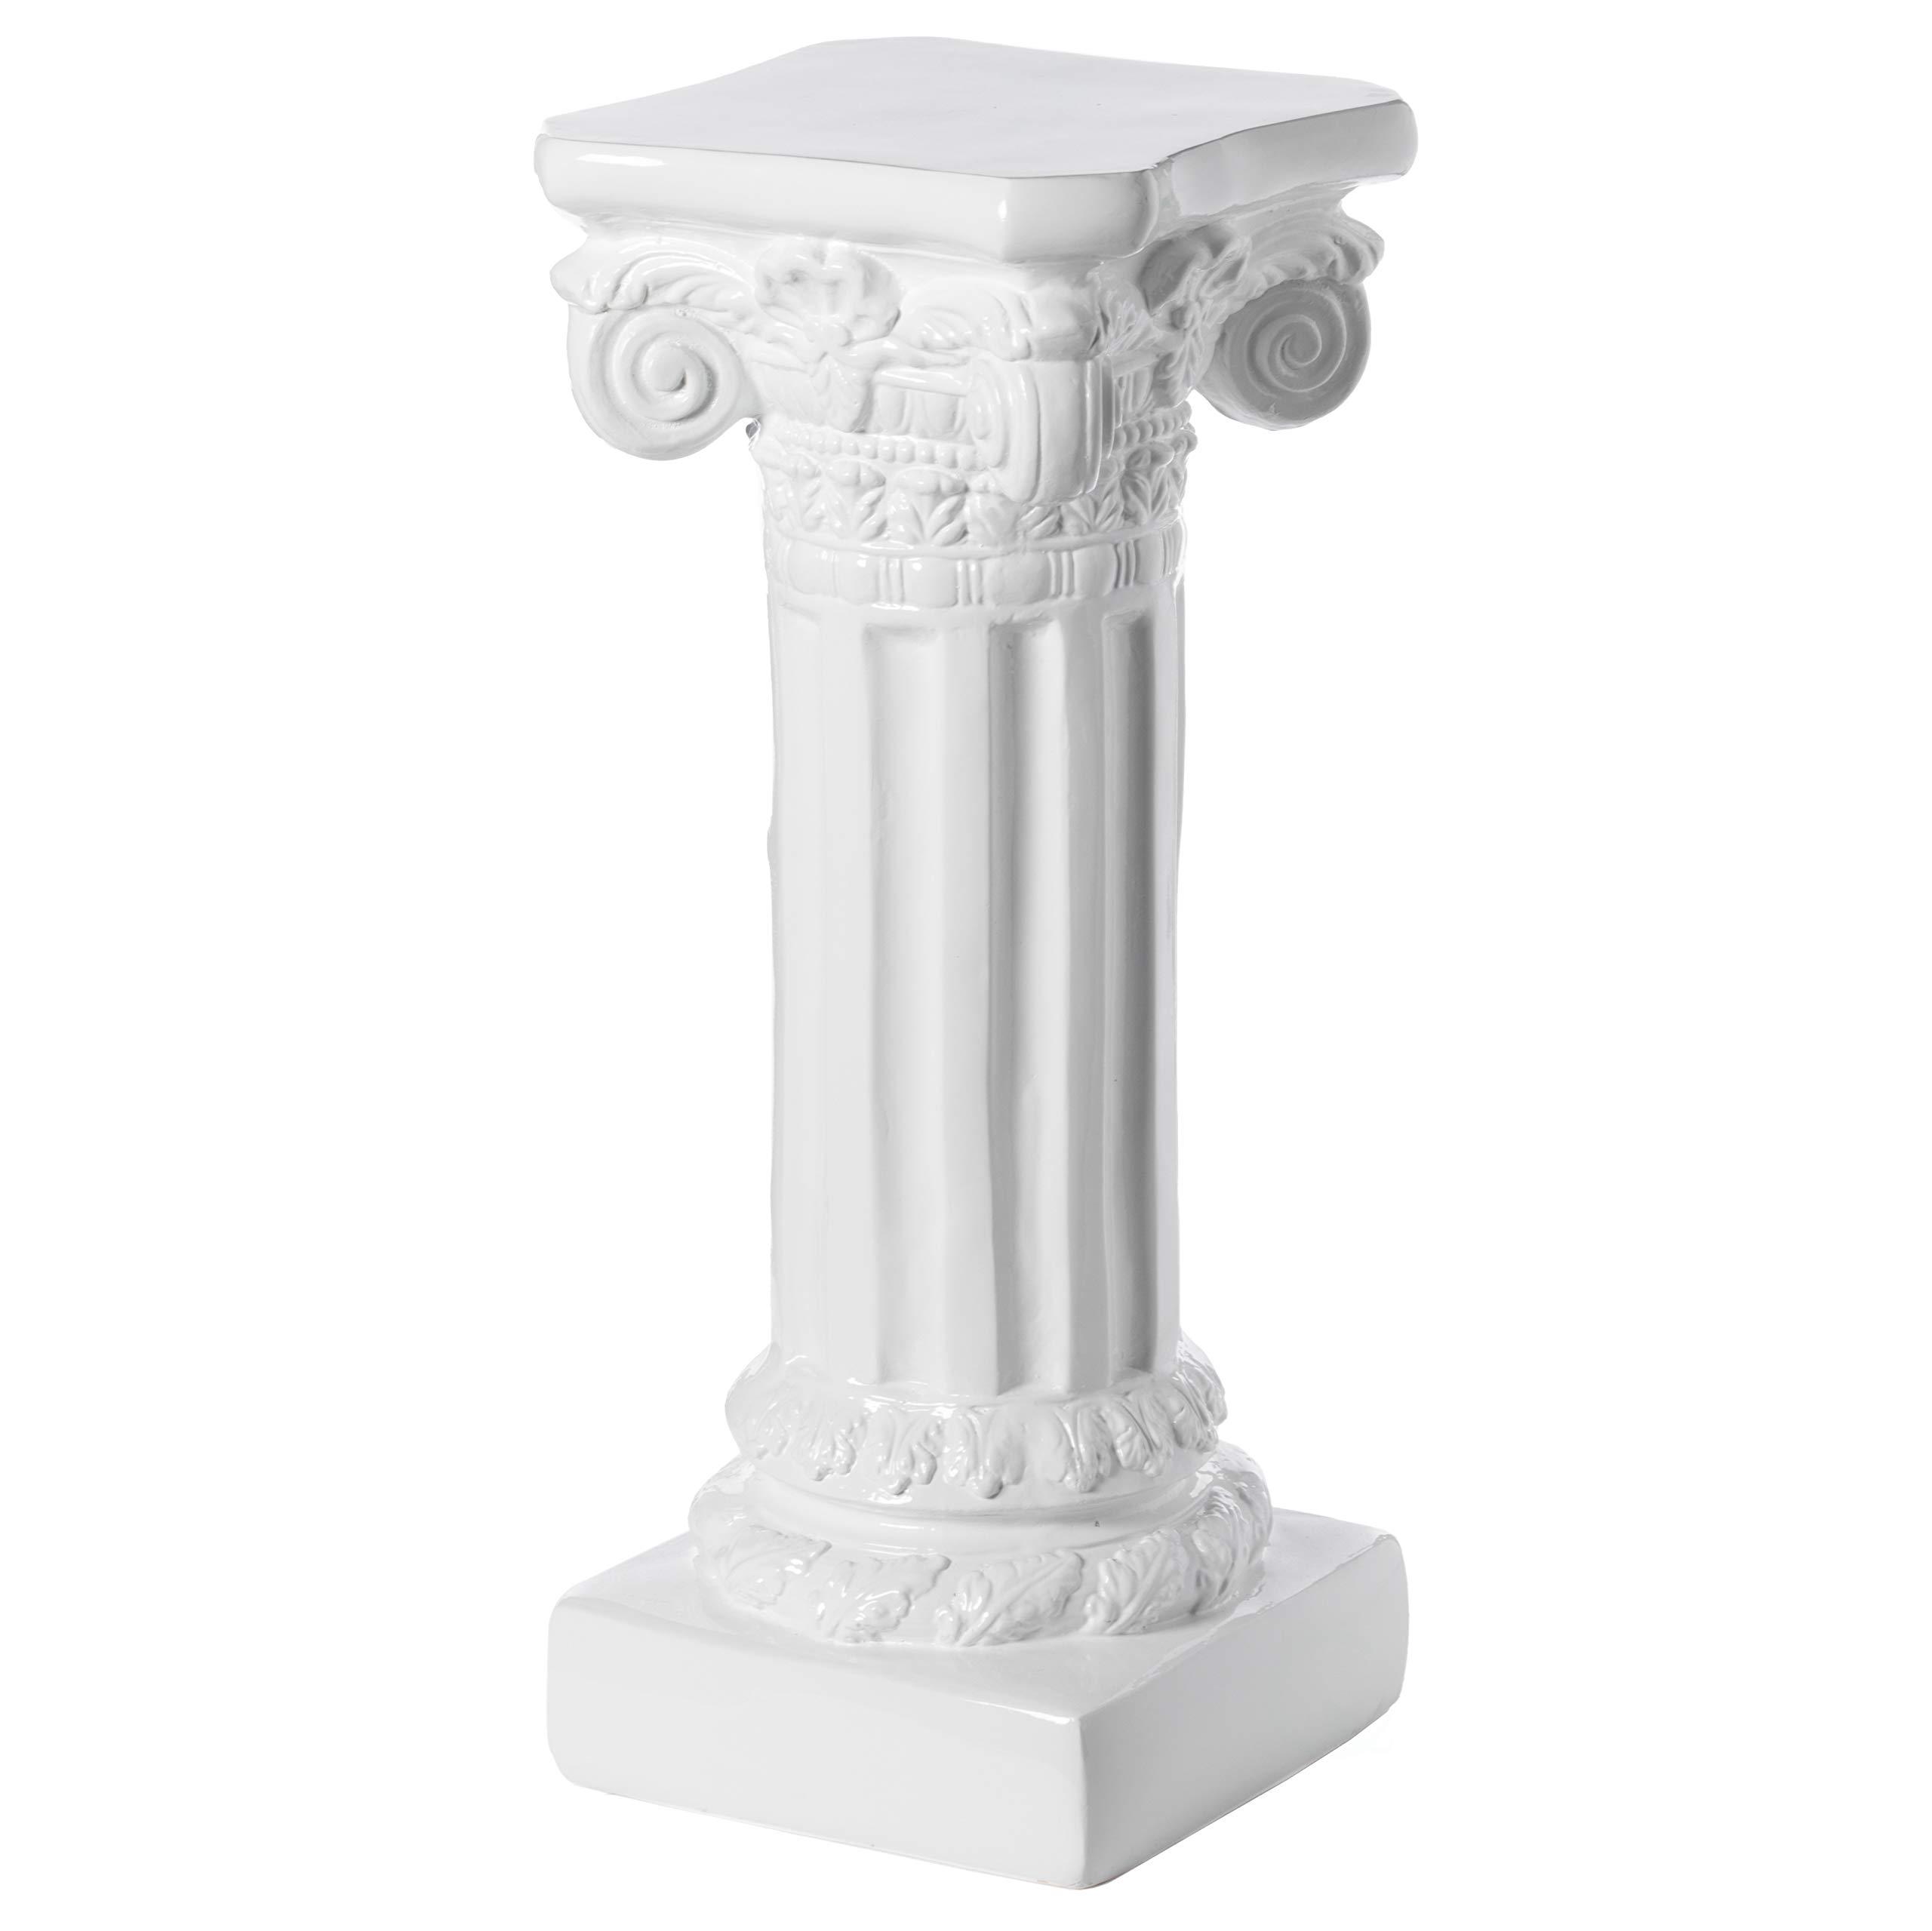 "Uniquewise Decor White Fiberglass Roman Style Column Pedestal, Display Flower Vase Stand, 32"", High"